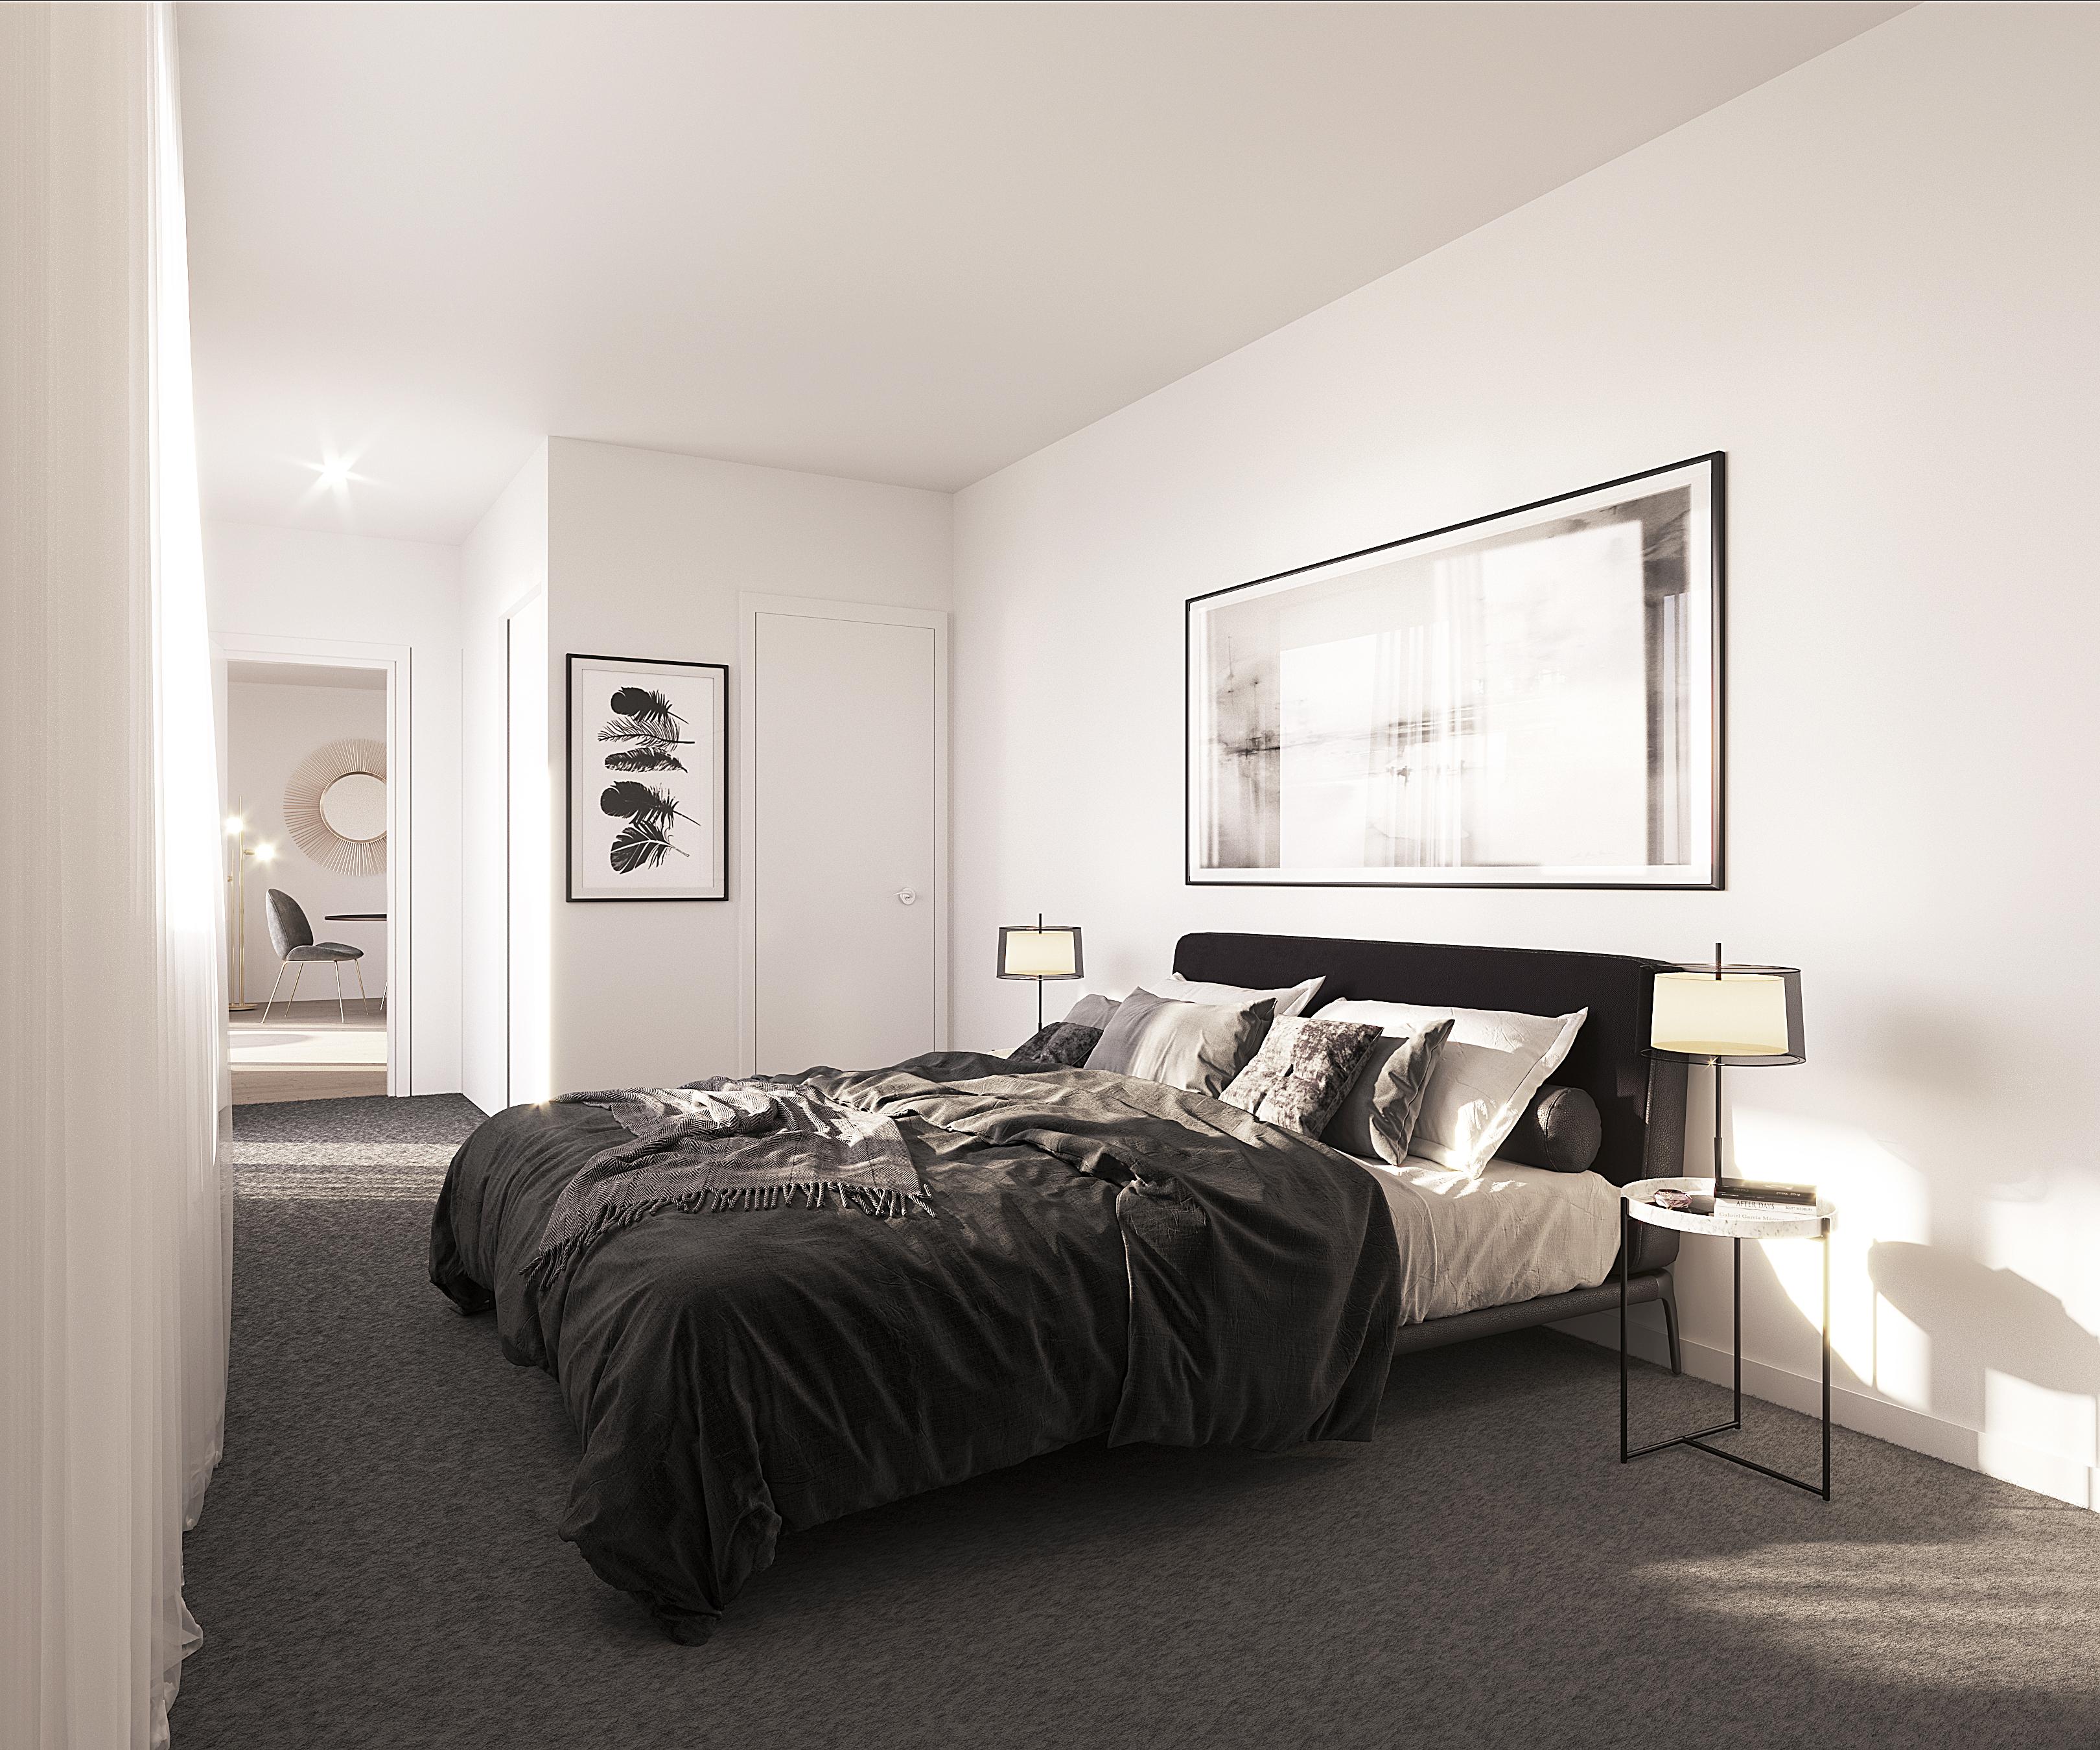 delgaty_bedroom_final_3240x2700_adjusted